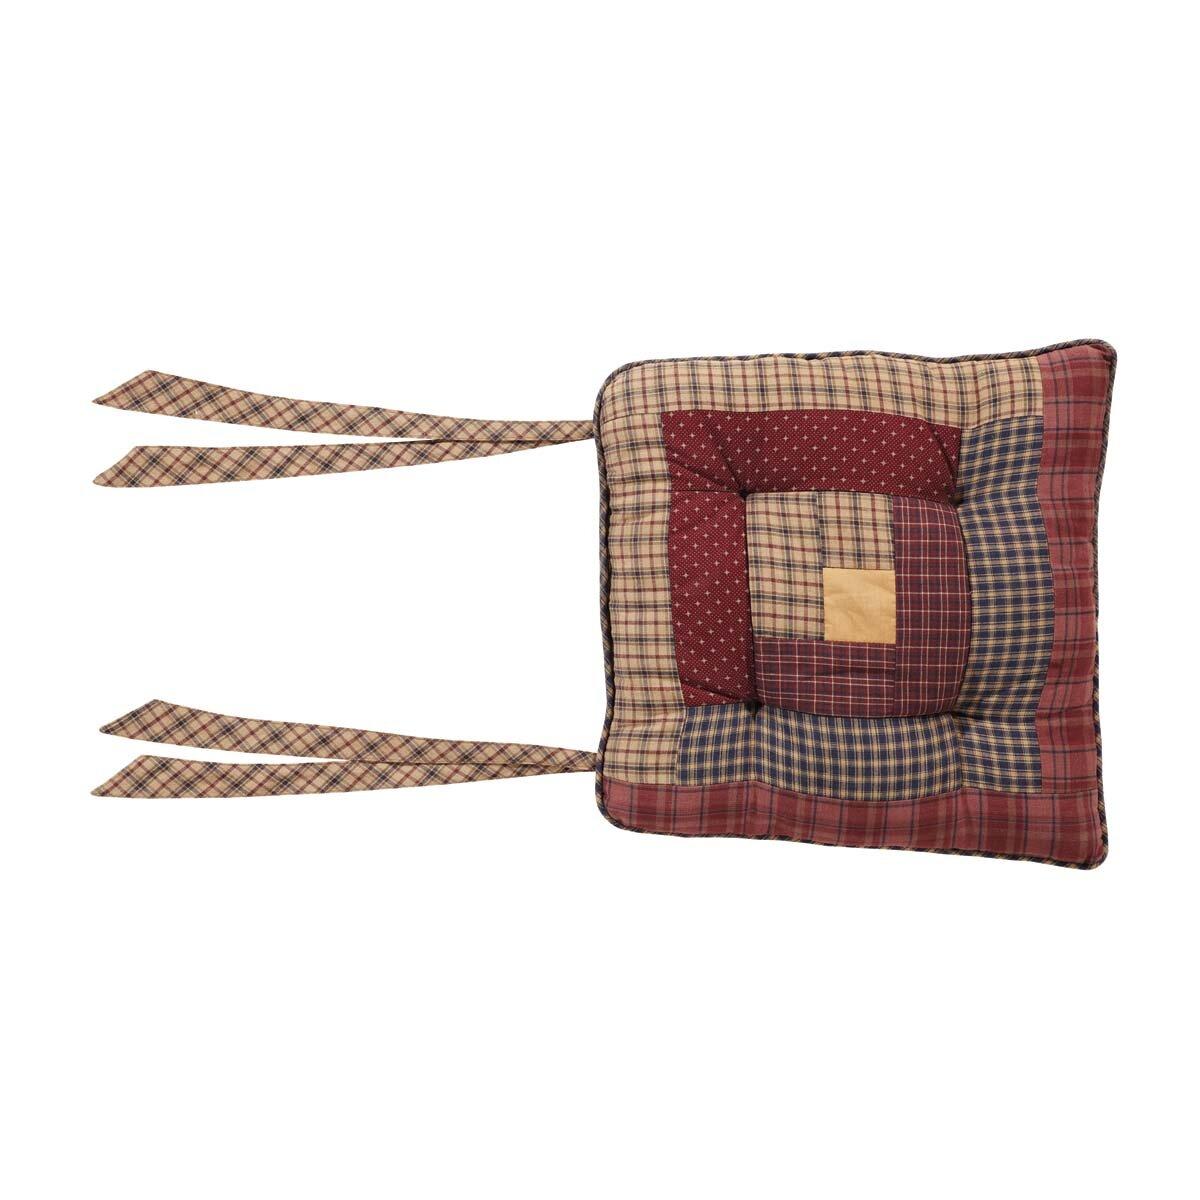 August Grove Log Cabin Patch Seat Cushion Wayfair